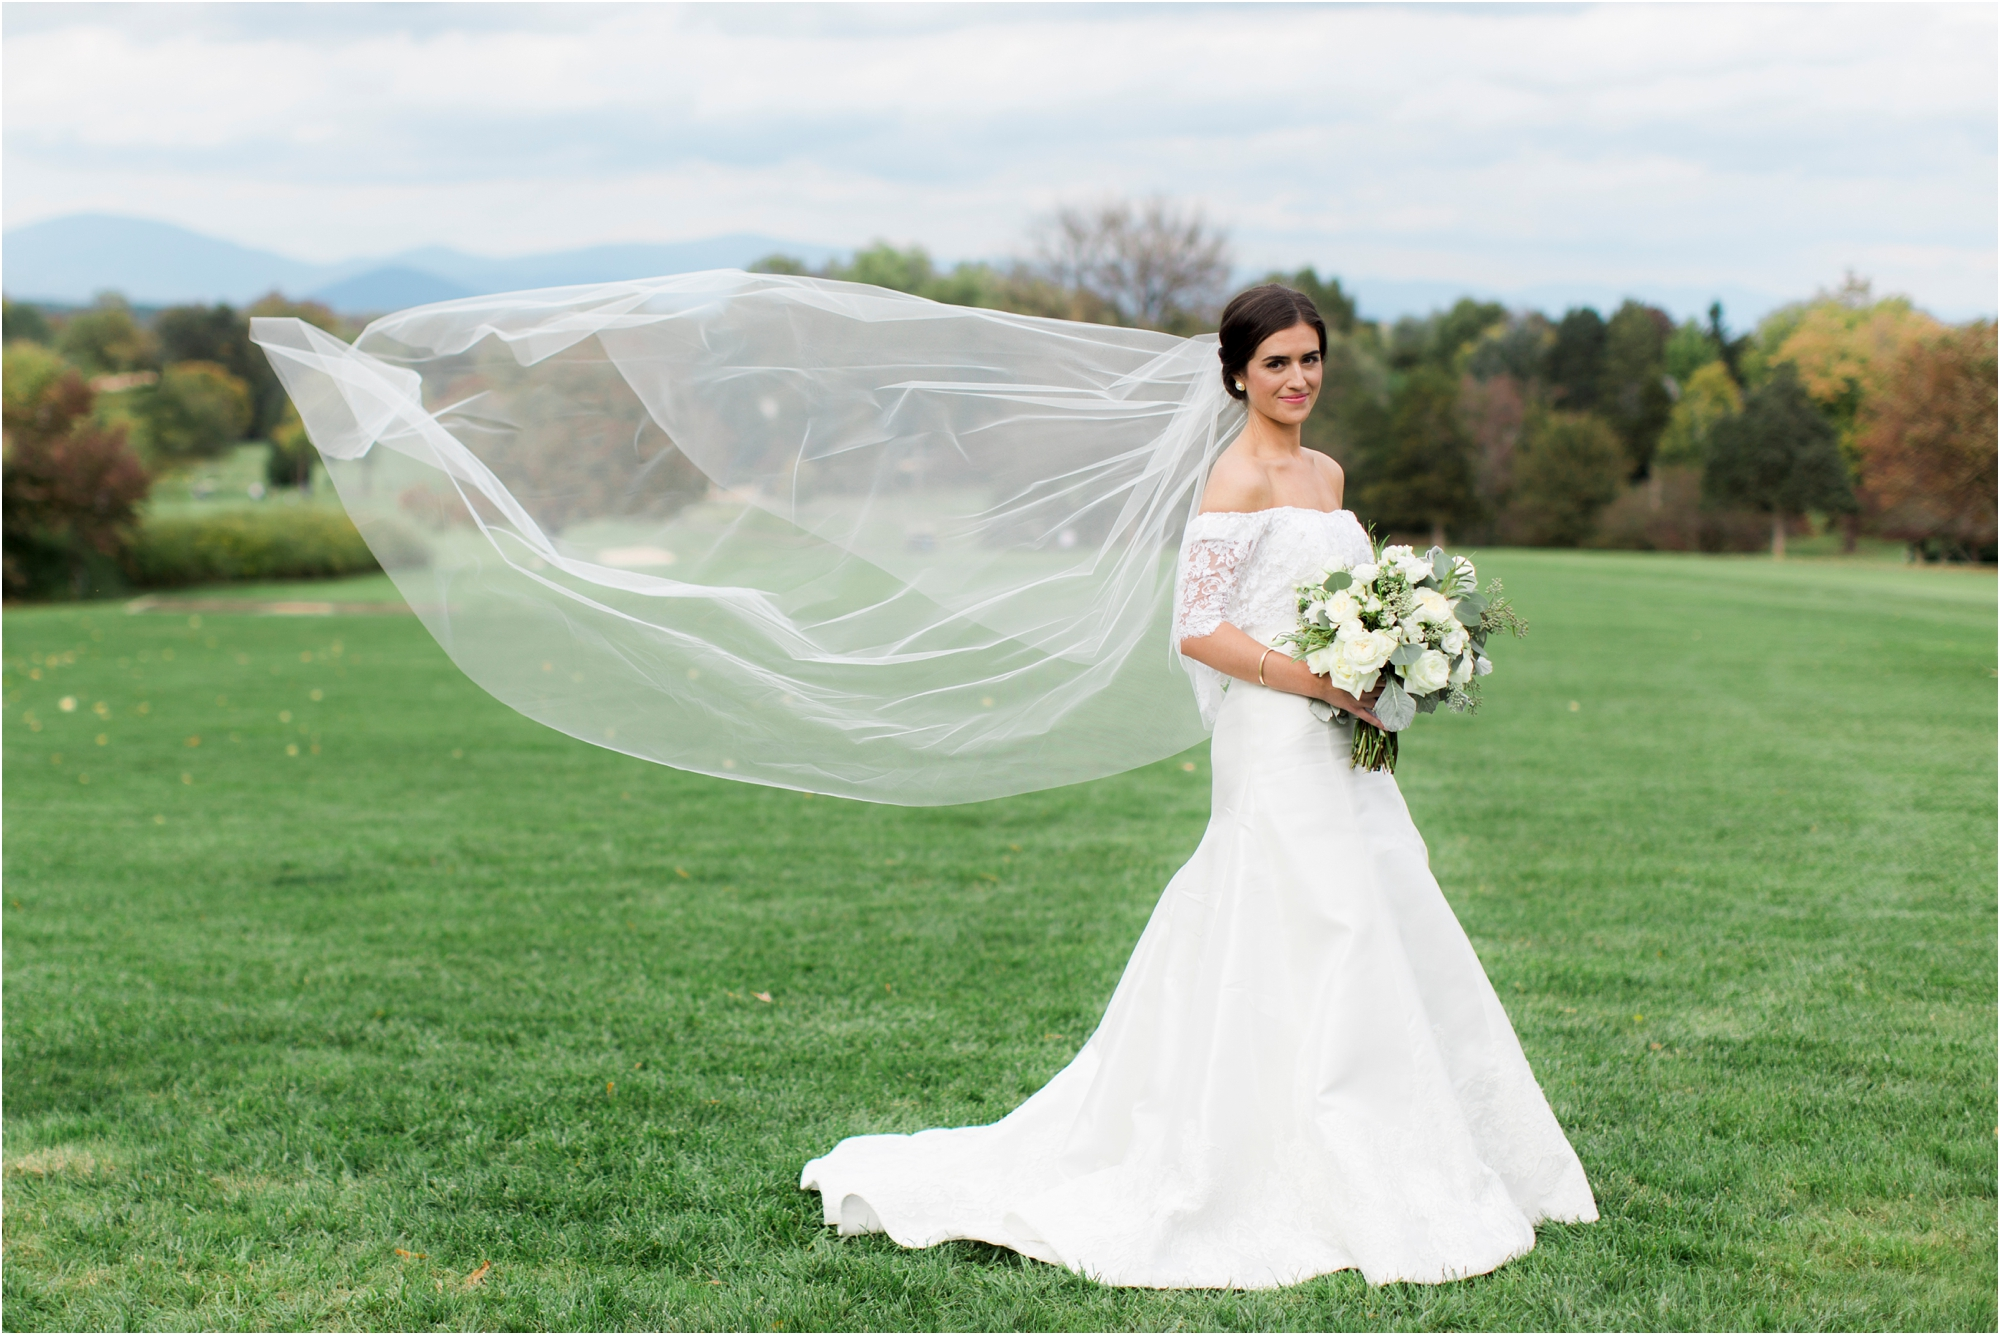 claire-thomas-farmington-country-club-charlottesville-virginia-wedding-photos_0019.jpg